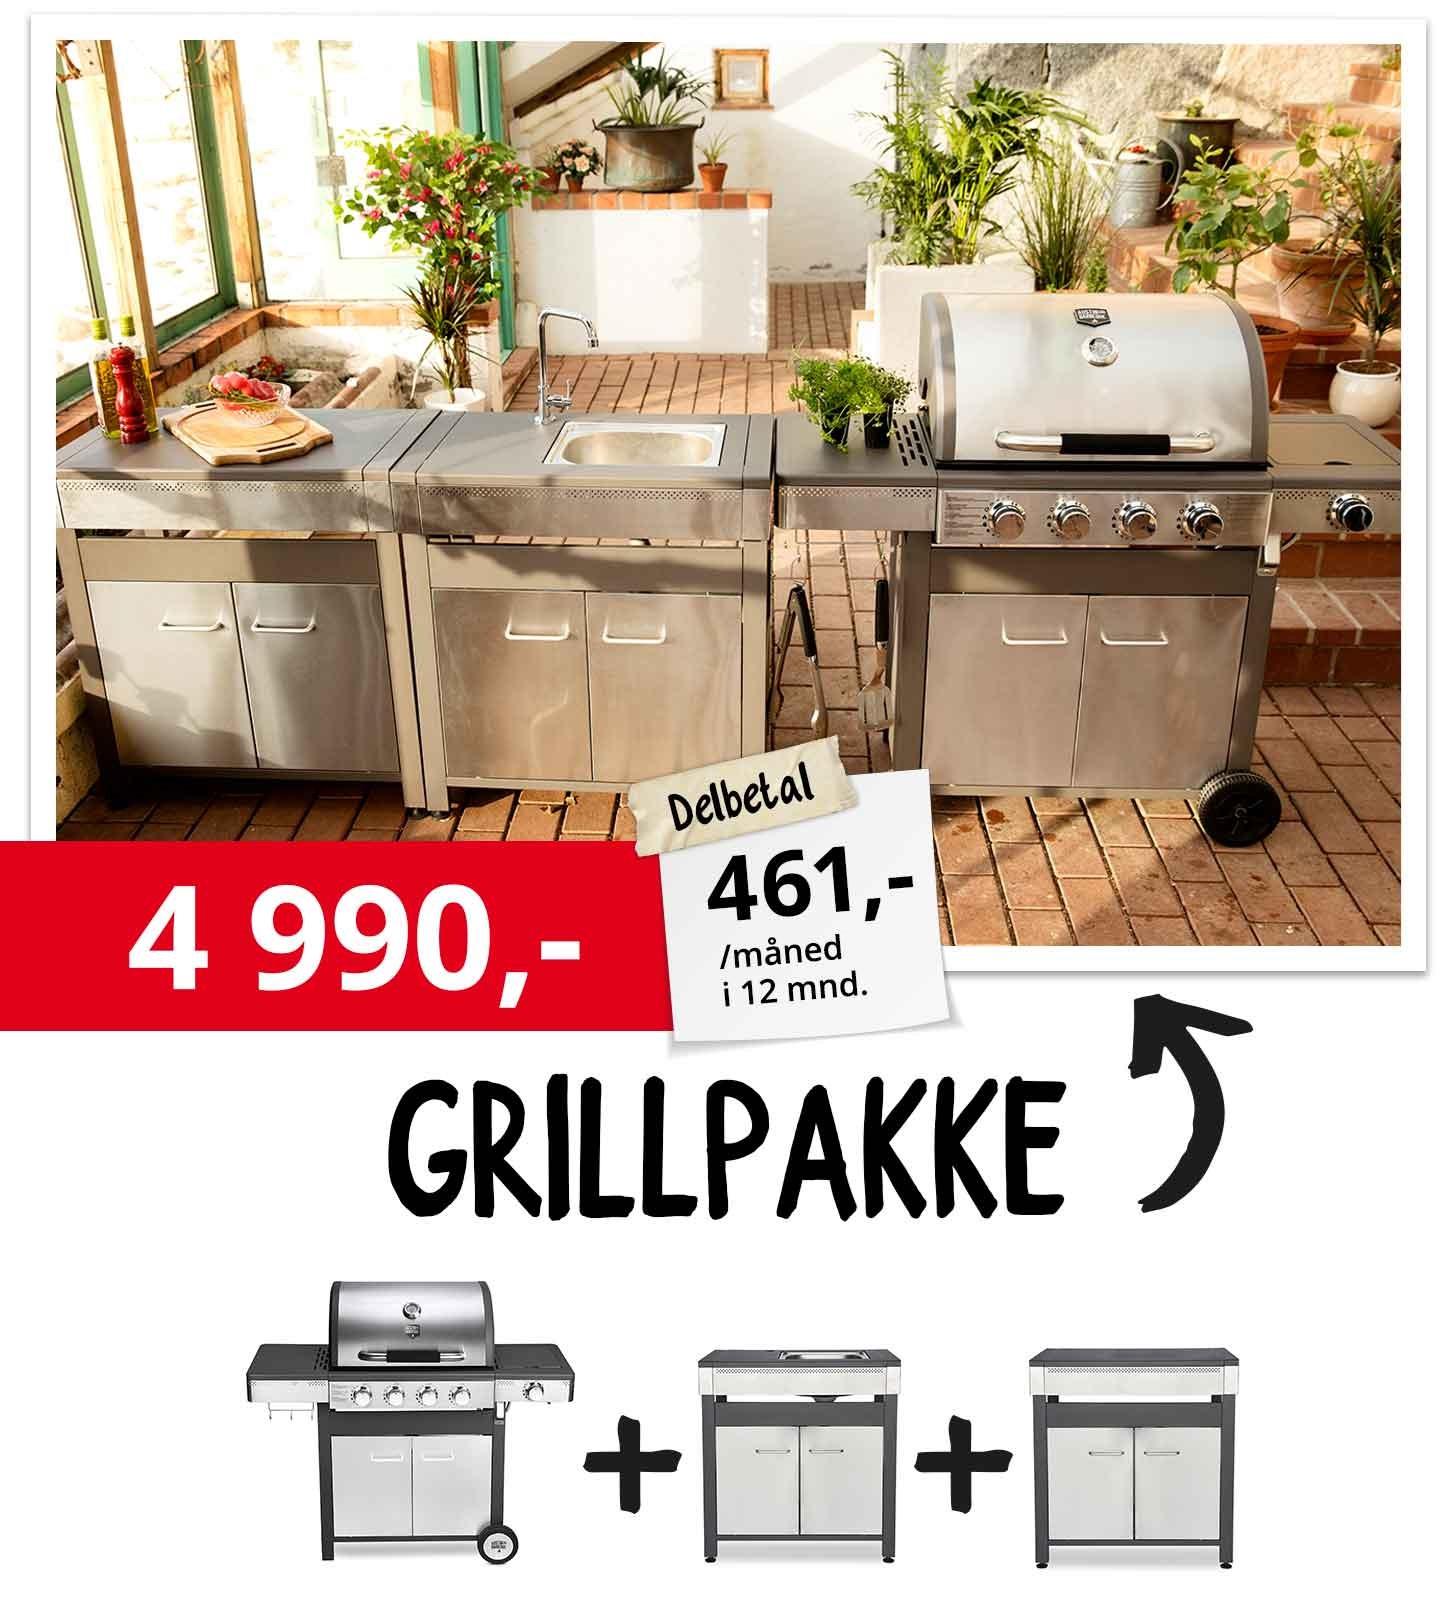 Grillpakke 6490,-